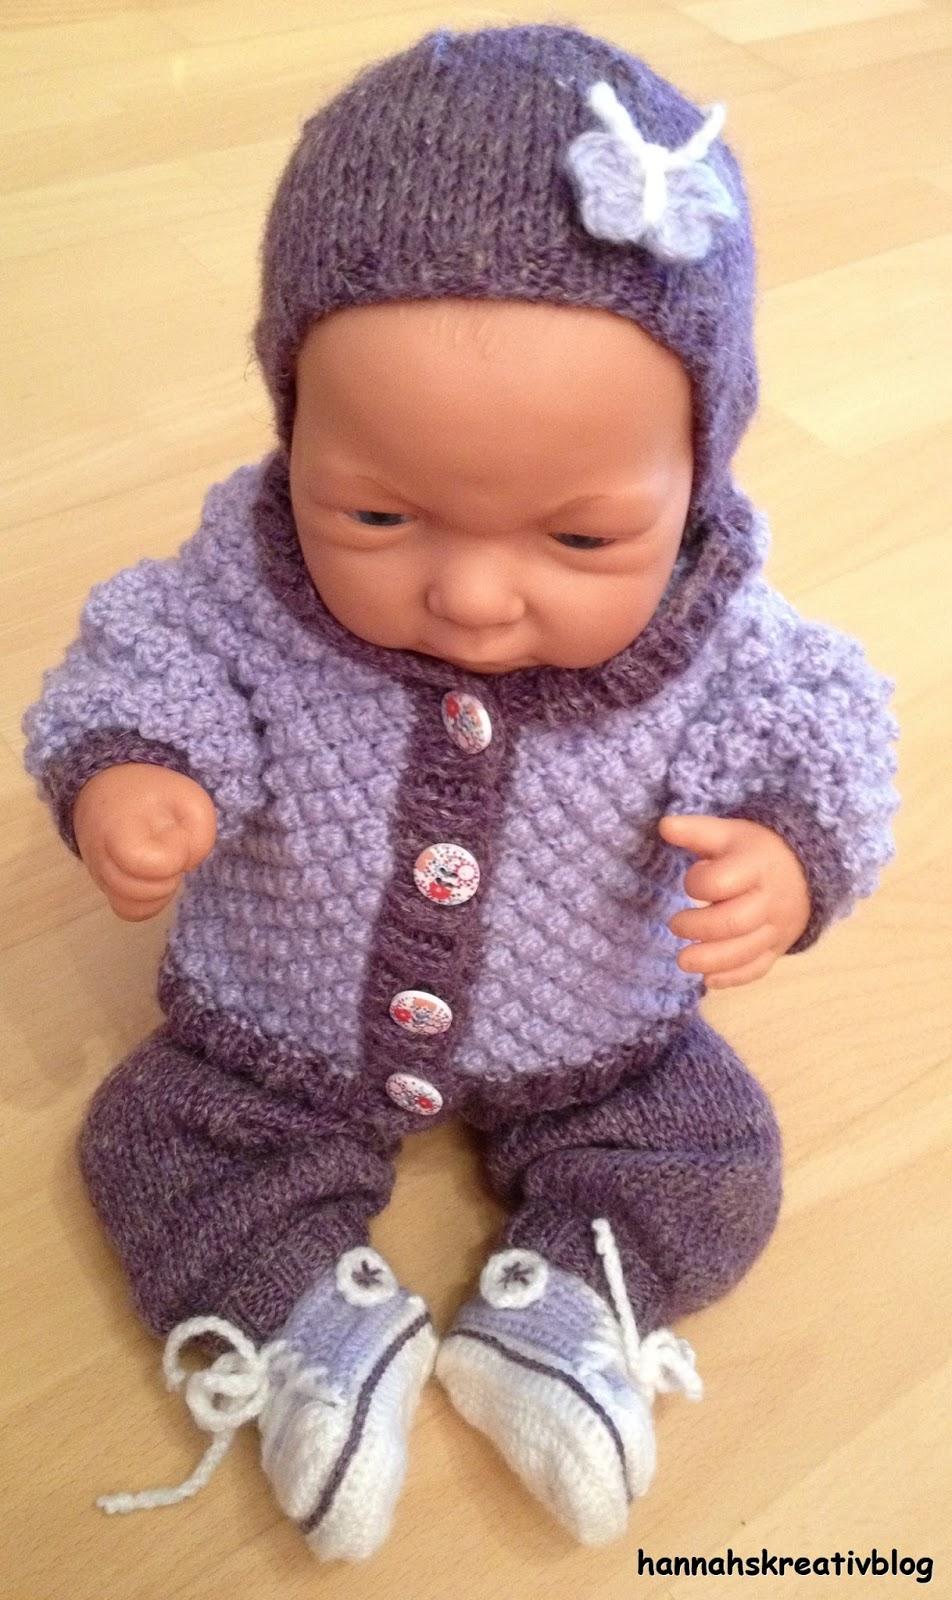 Hannahs Kreativblog Puppenkleidung Für Winter